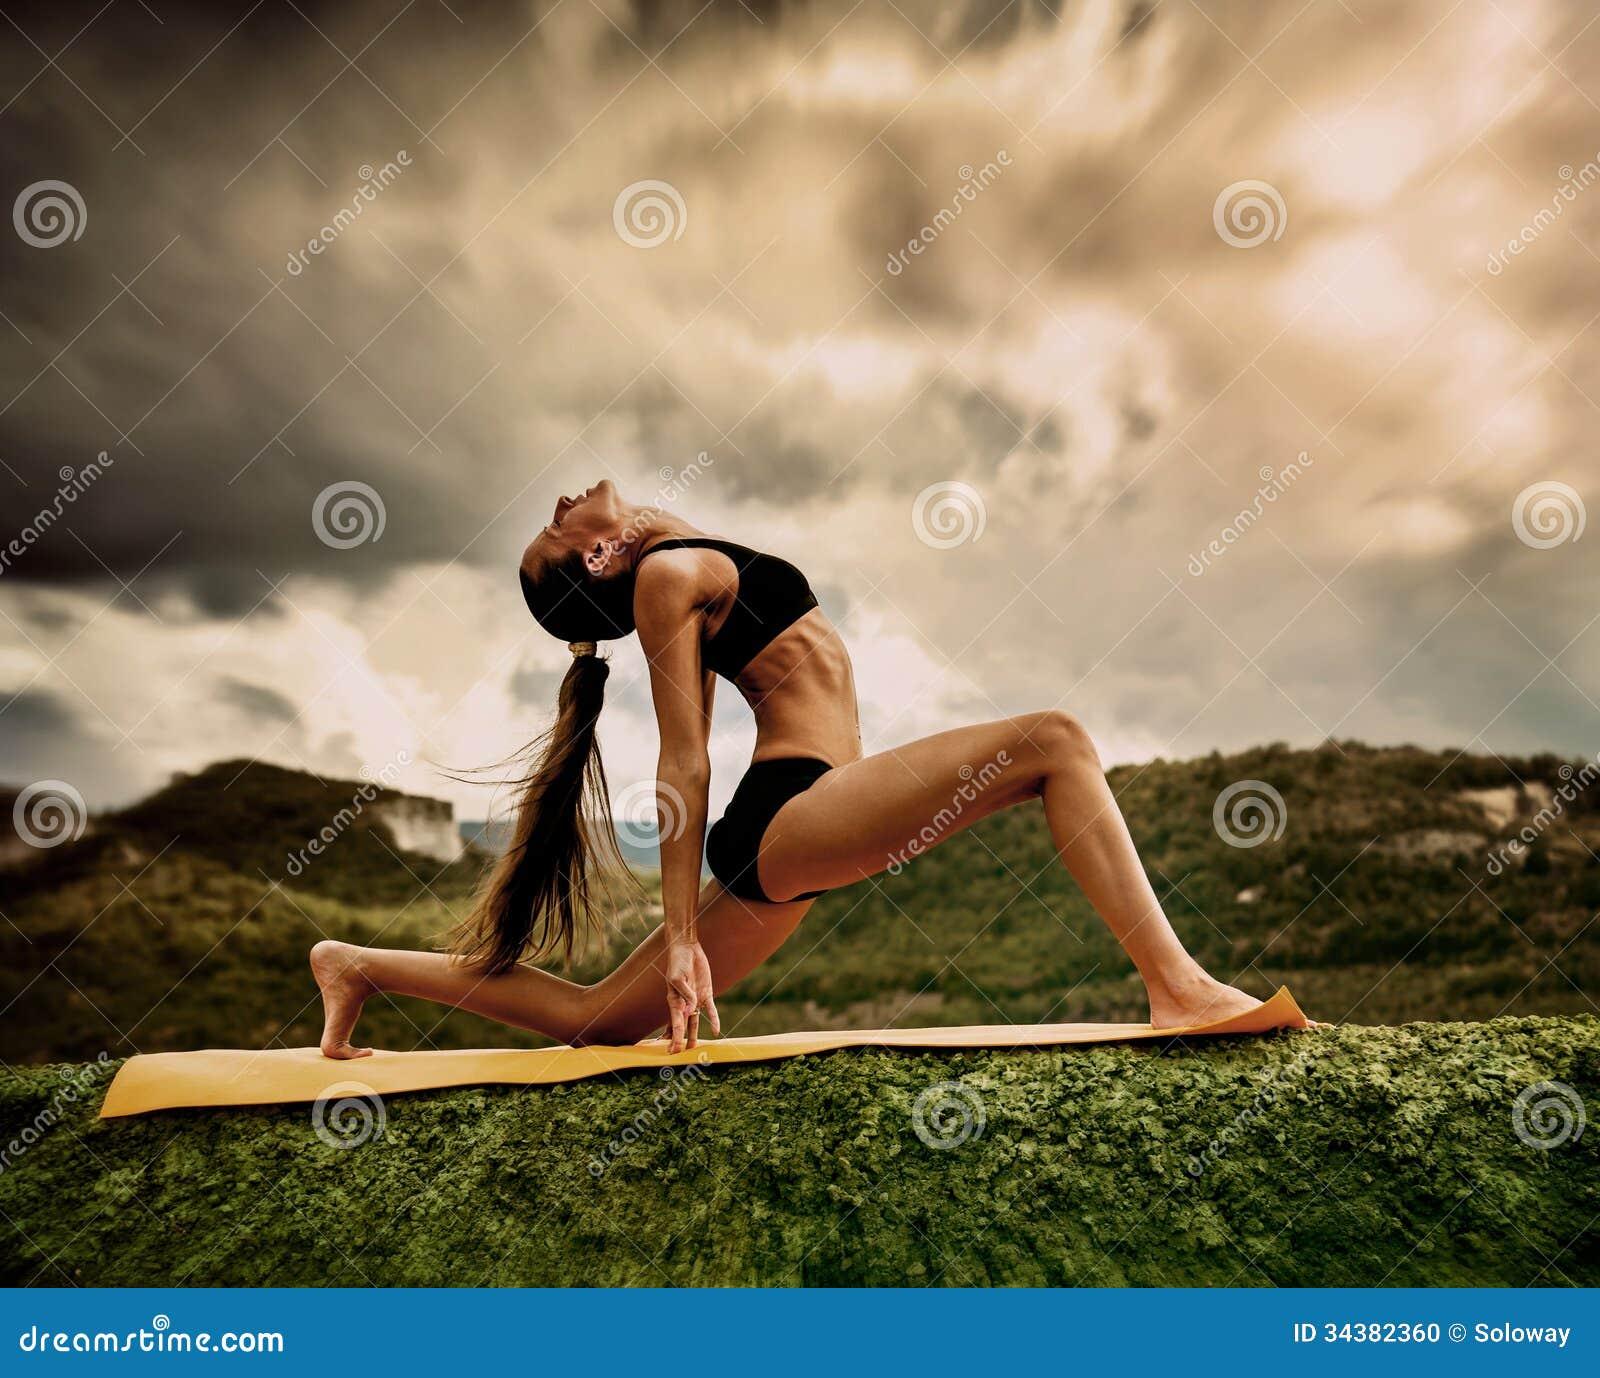 Yoga Meditation Pose Warrior Yoga Pose Stoc...